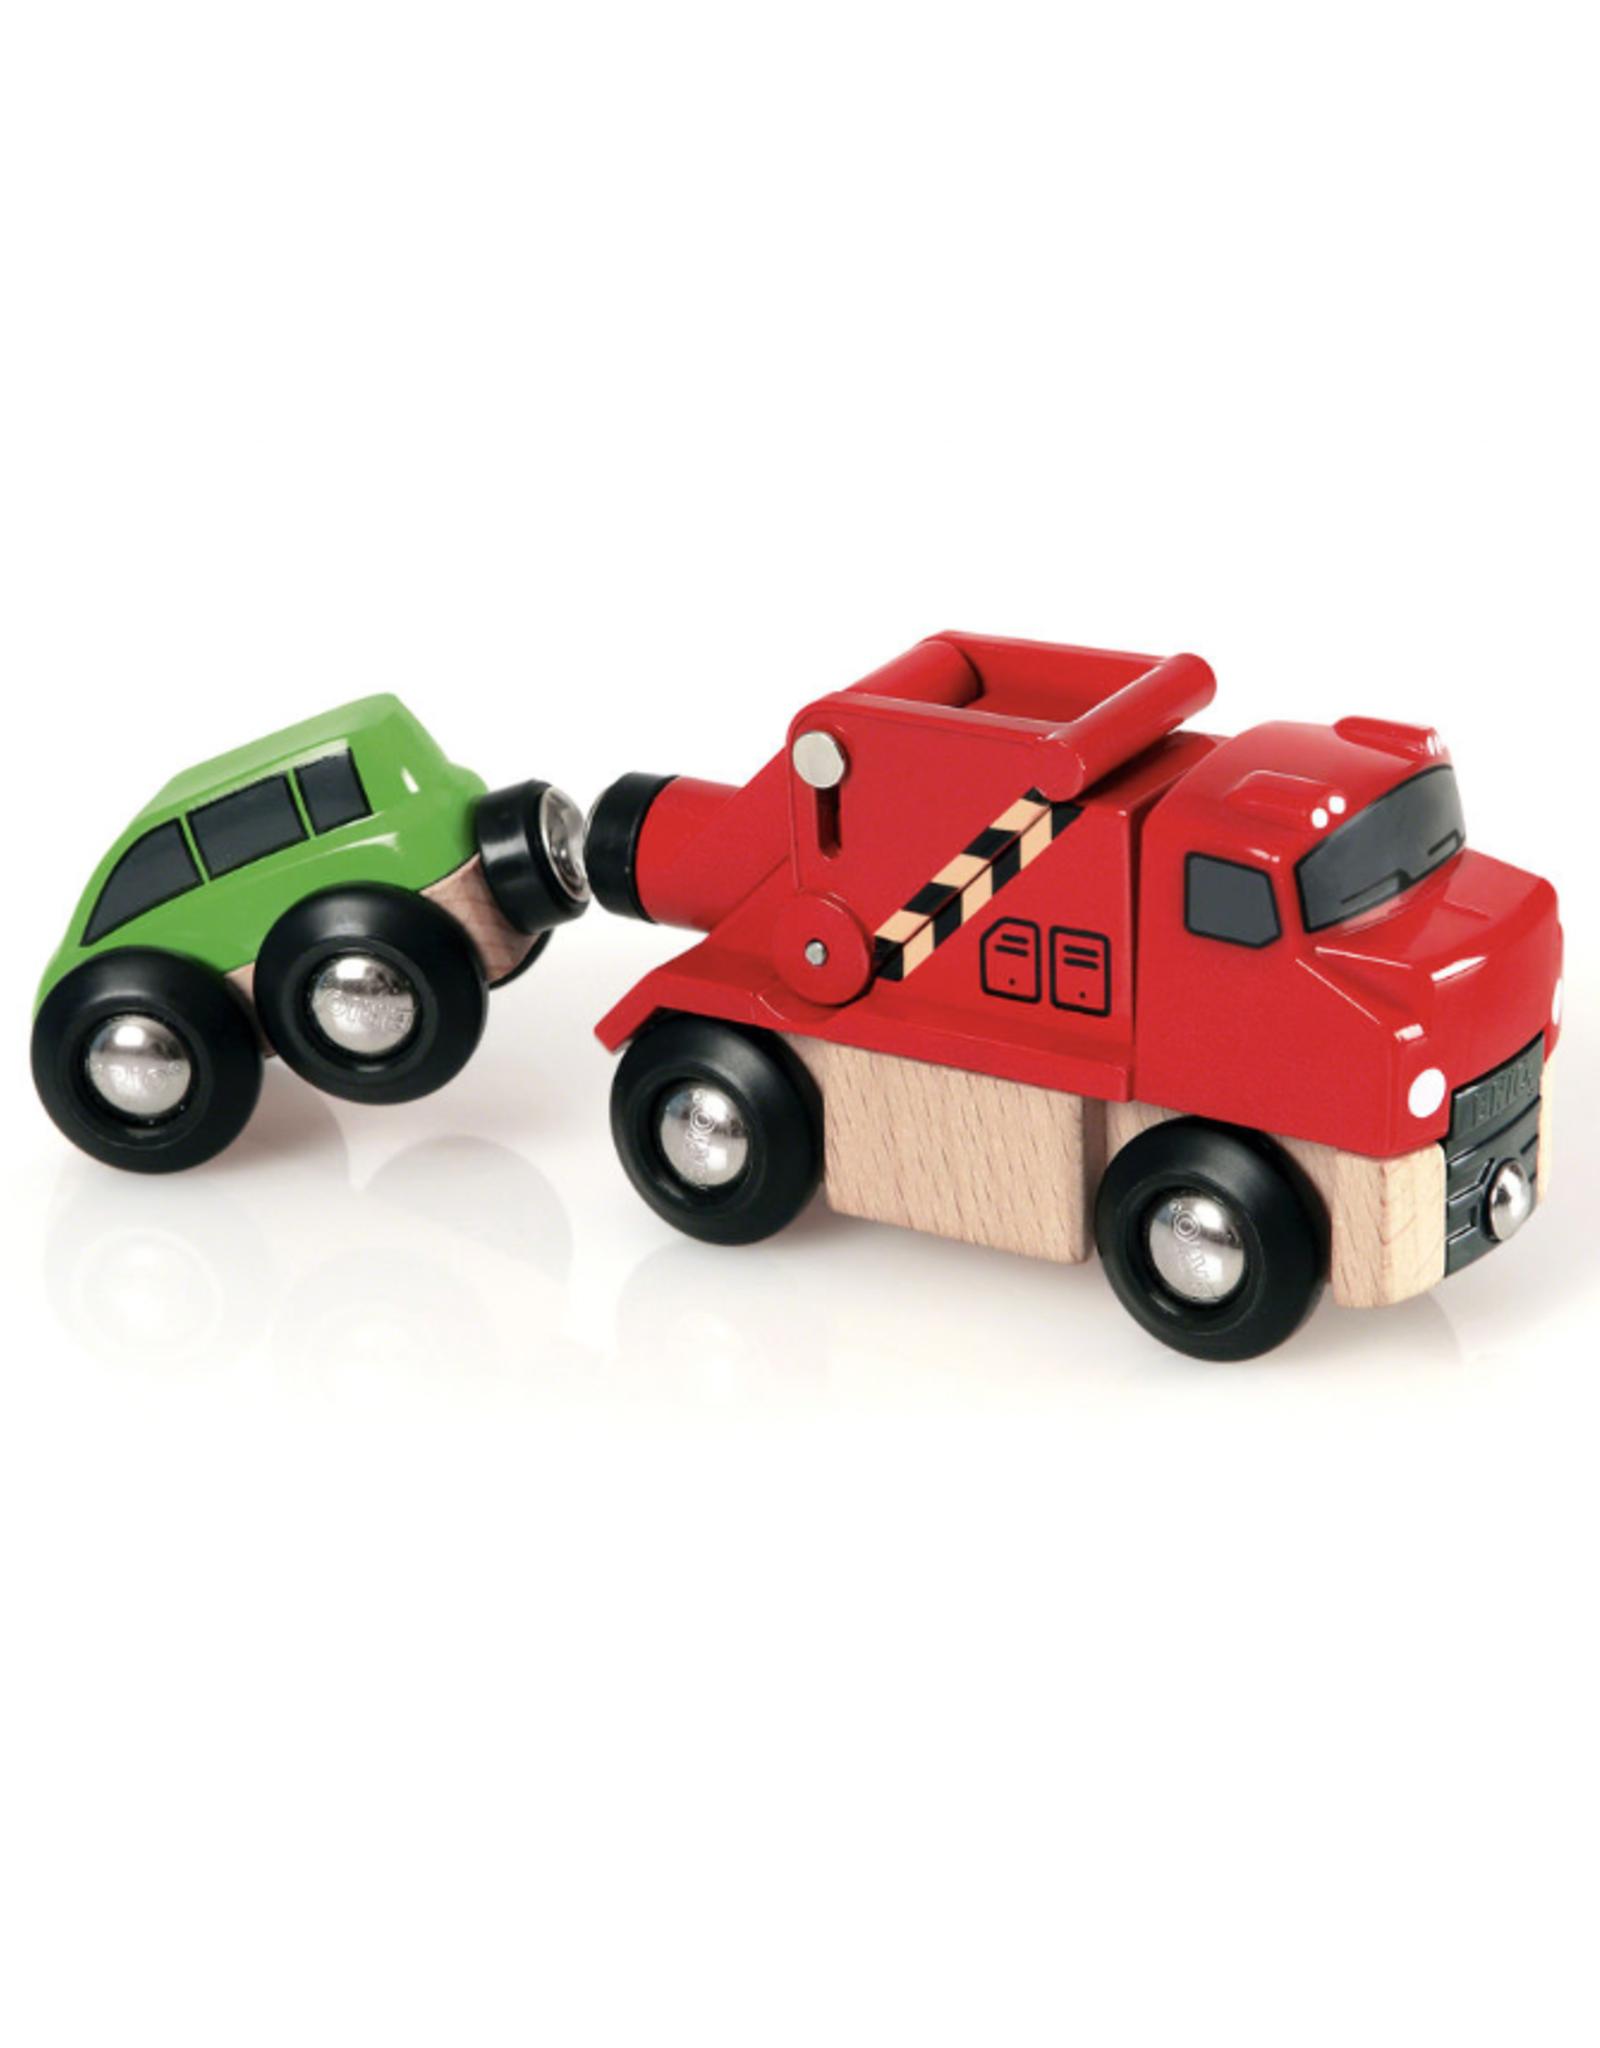 Brio Brio - Tow Truck